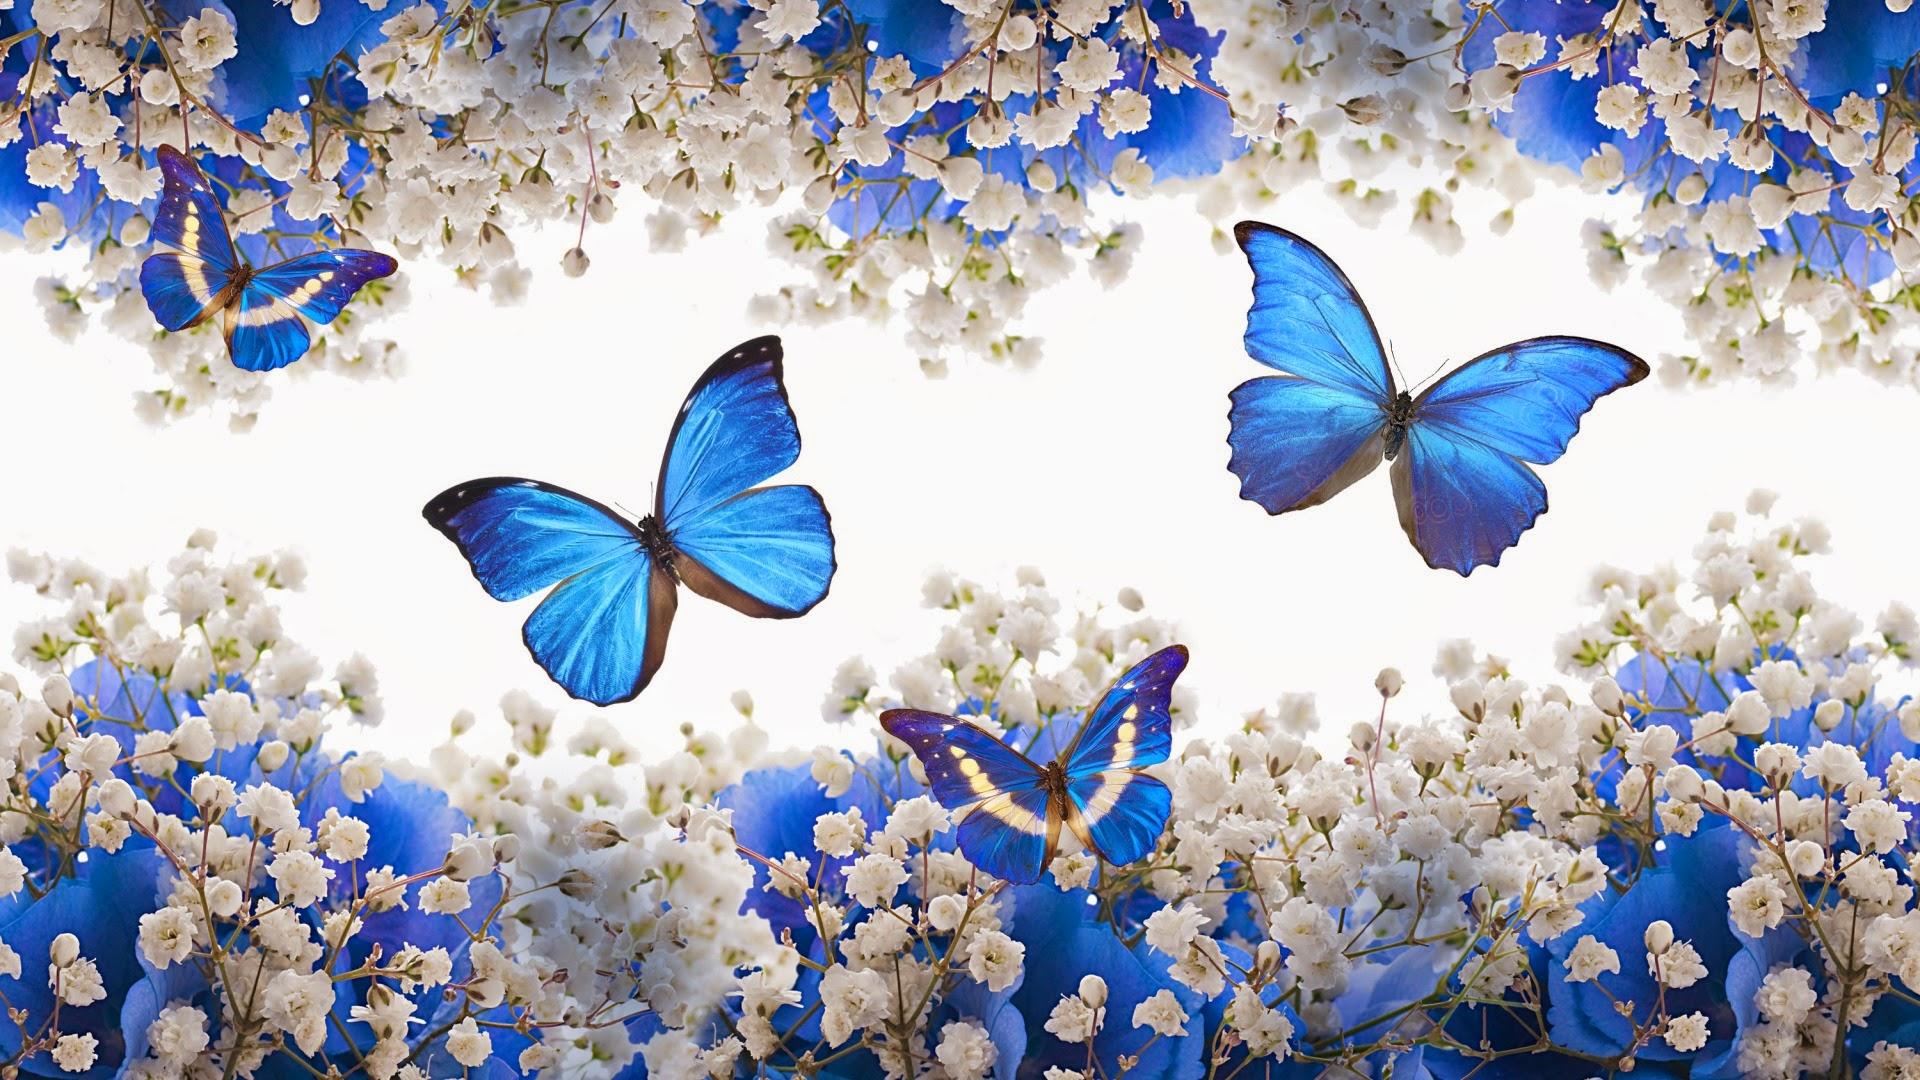 Mariposas azules wallpaper the image for Imagenes bonitas para fondo de pantalla